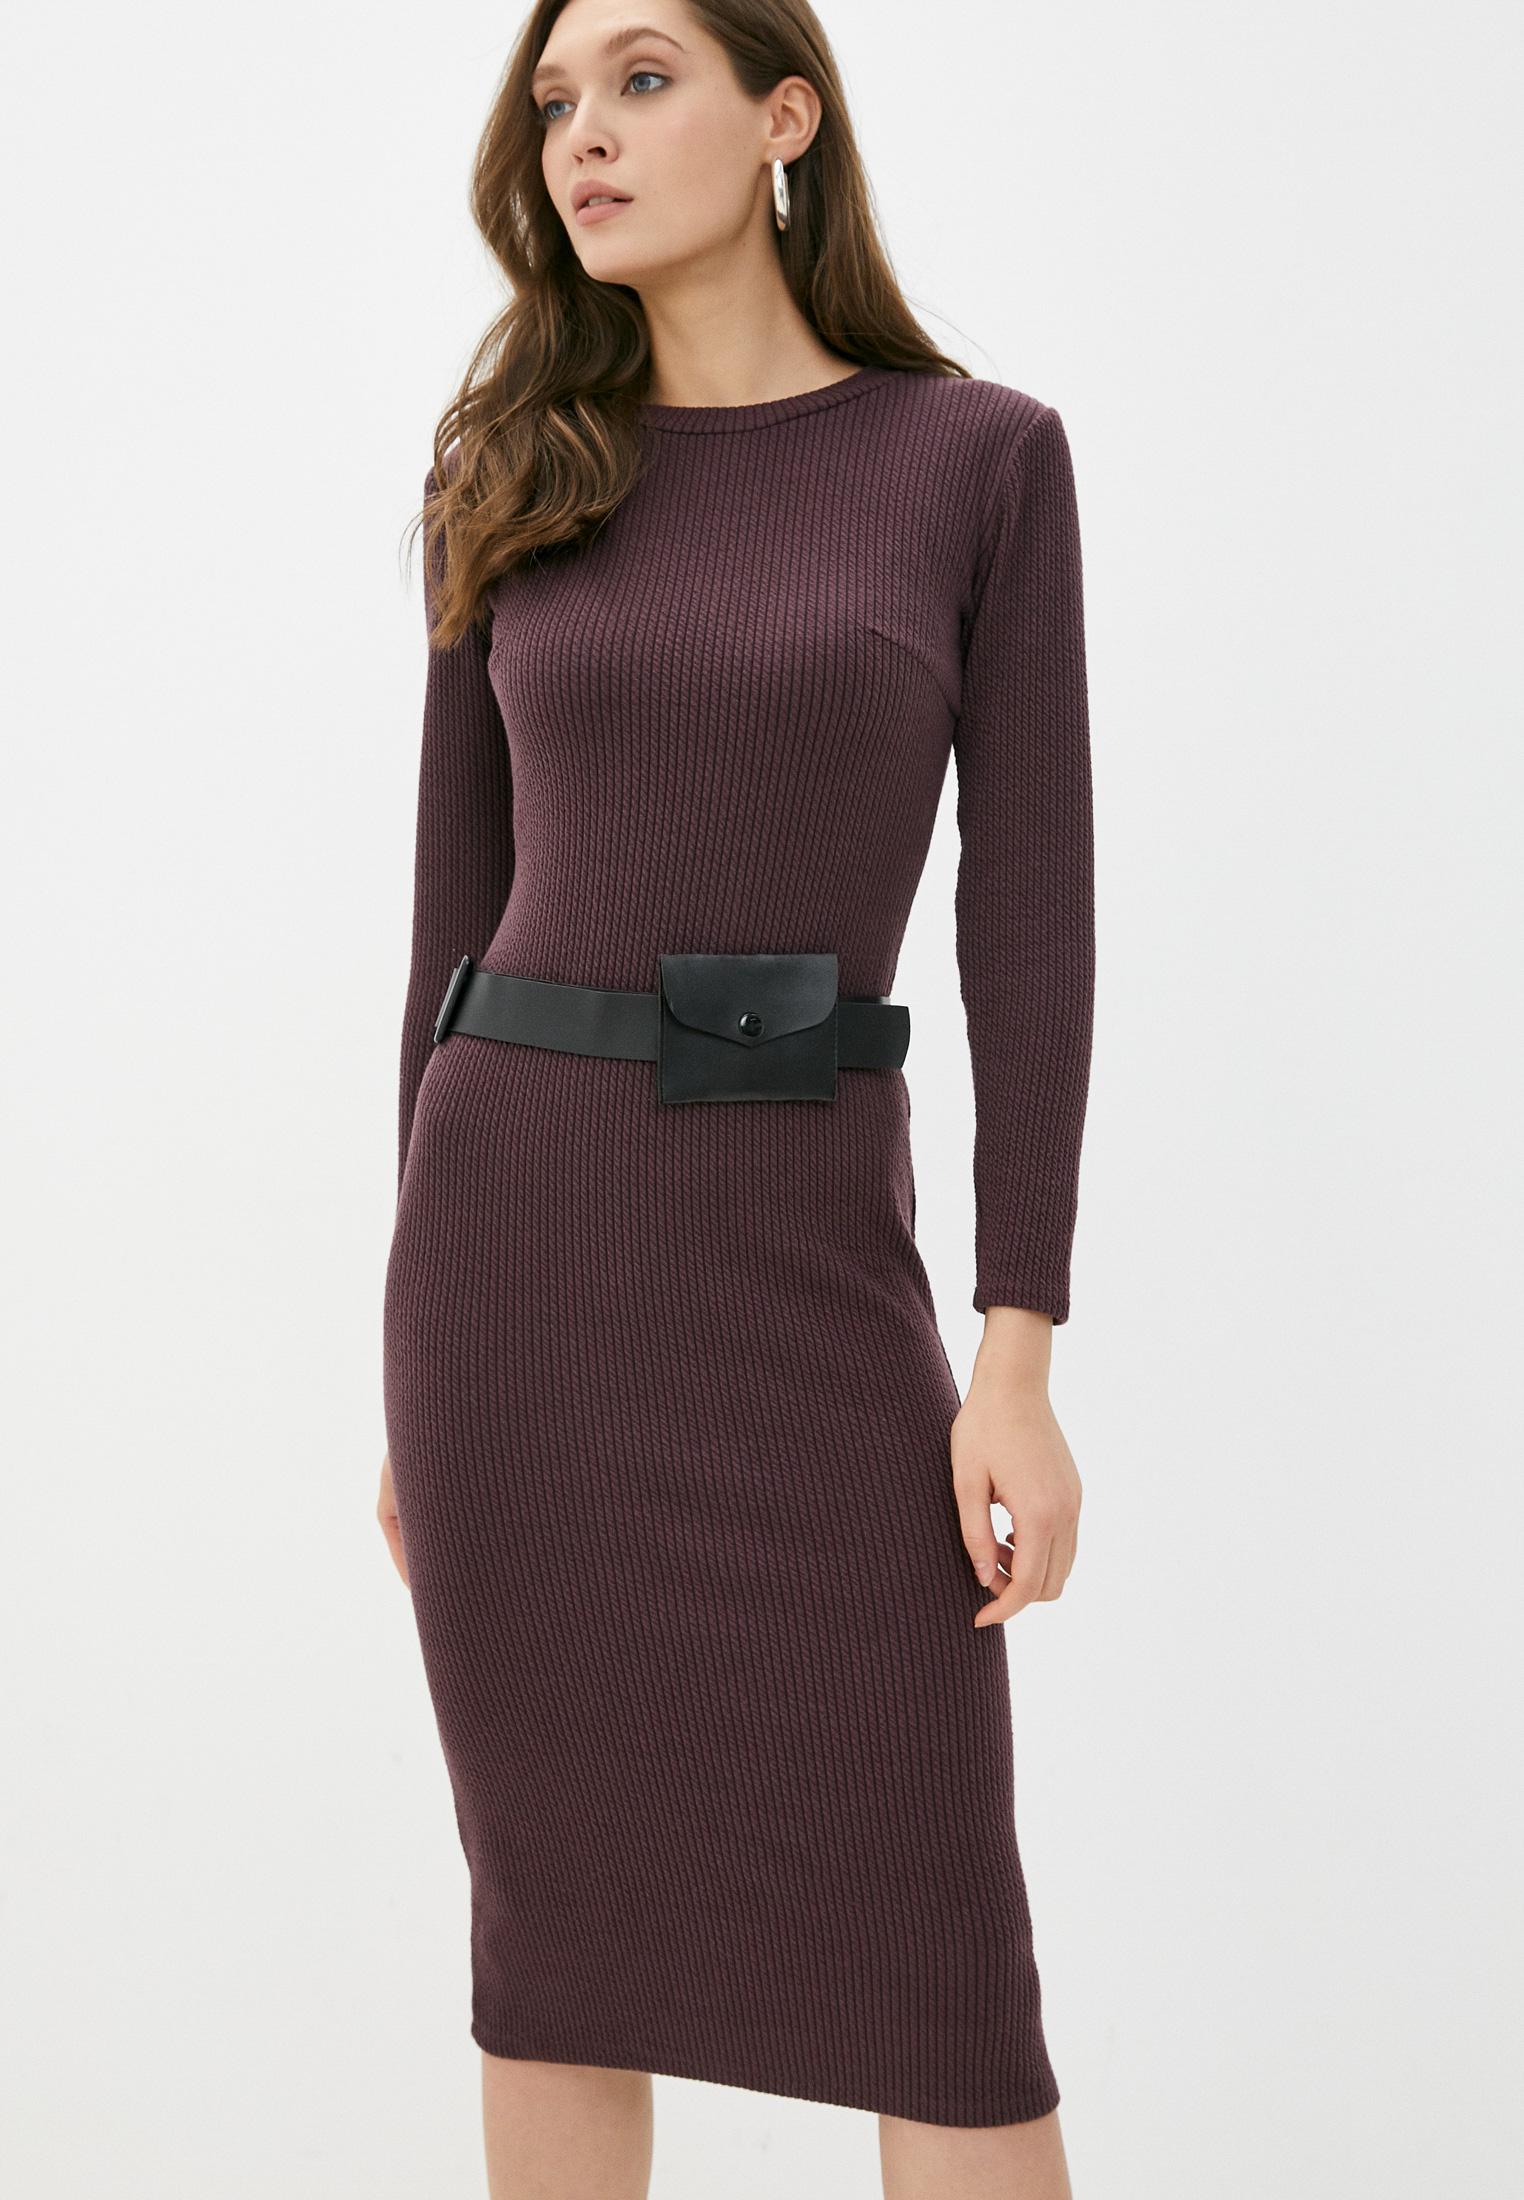 Вязаное платье Miss Gabby MG-4300